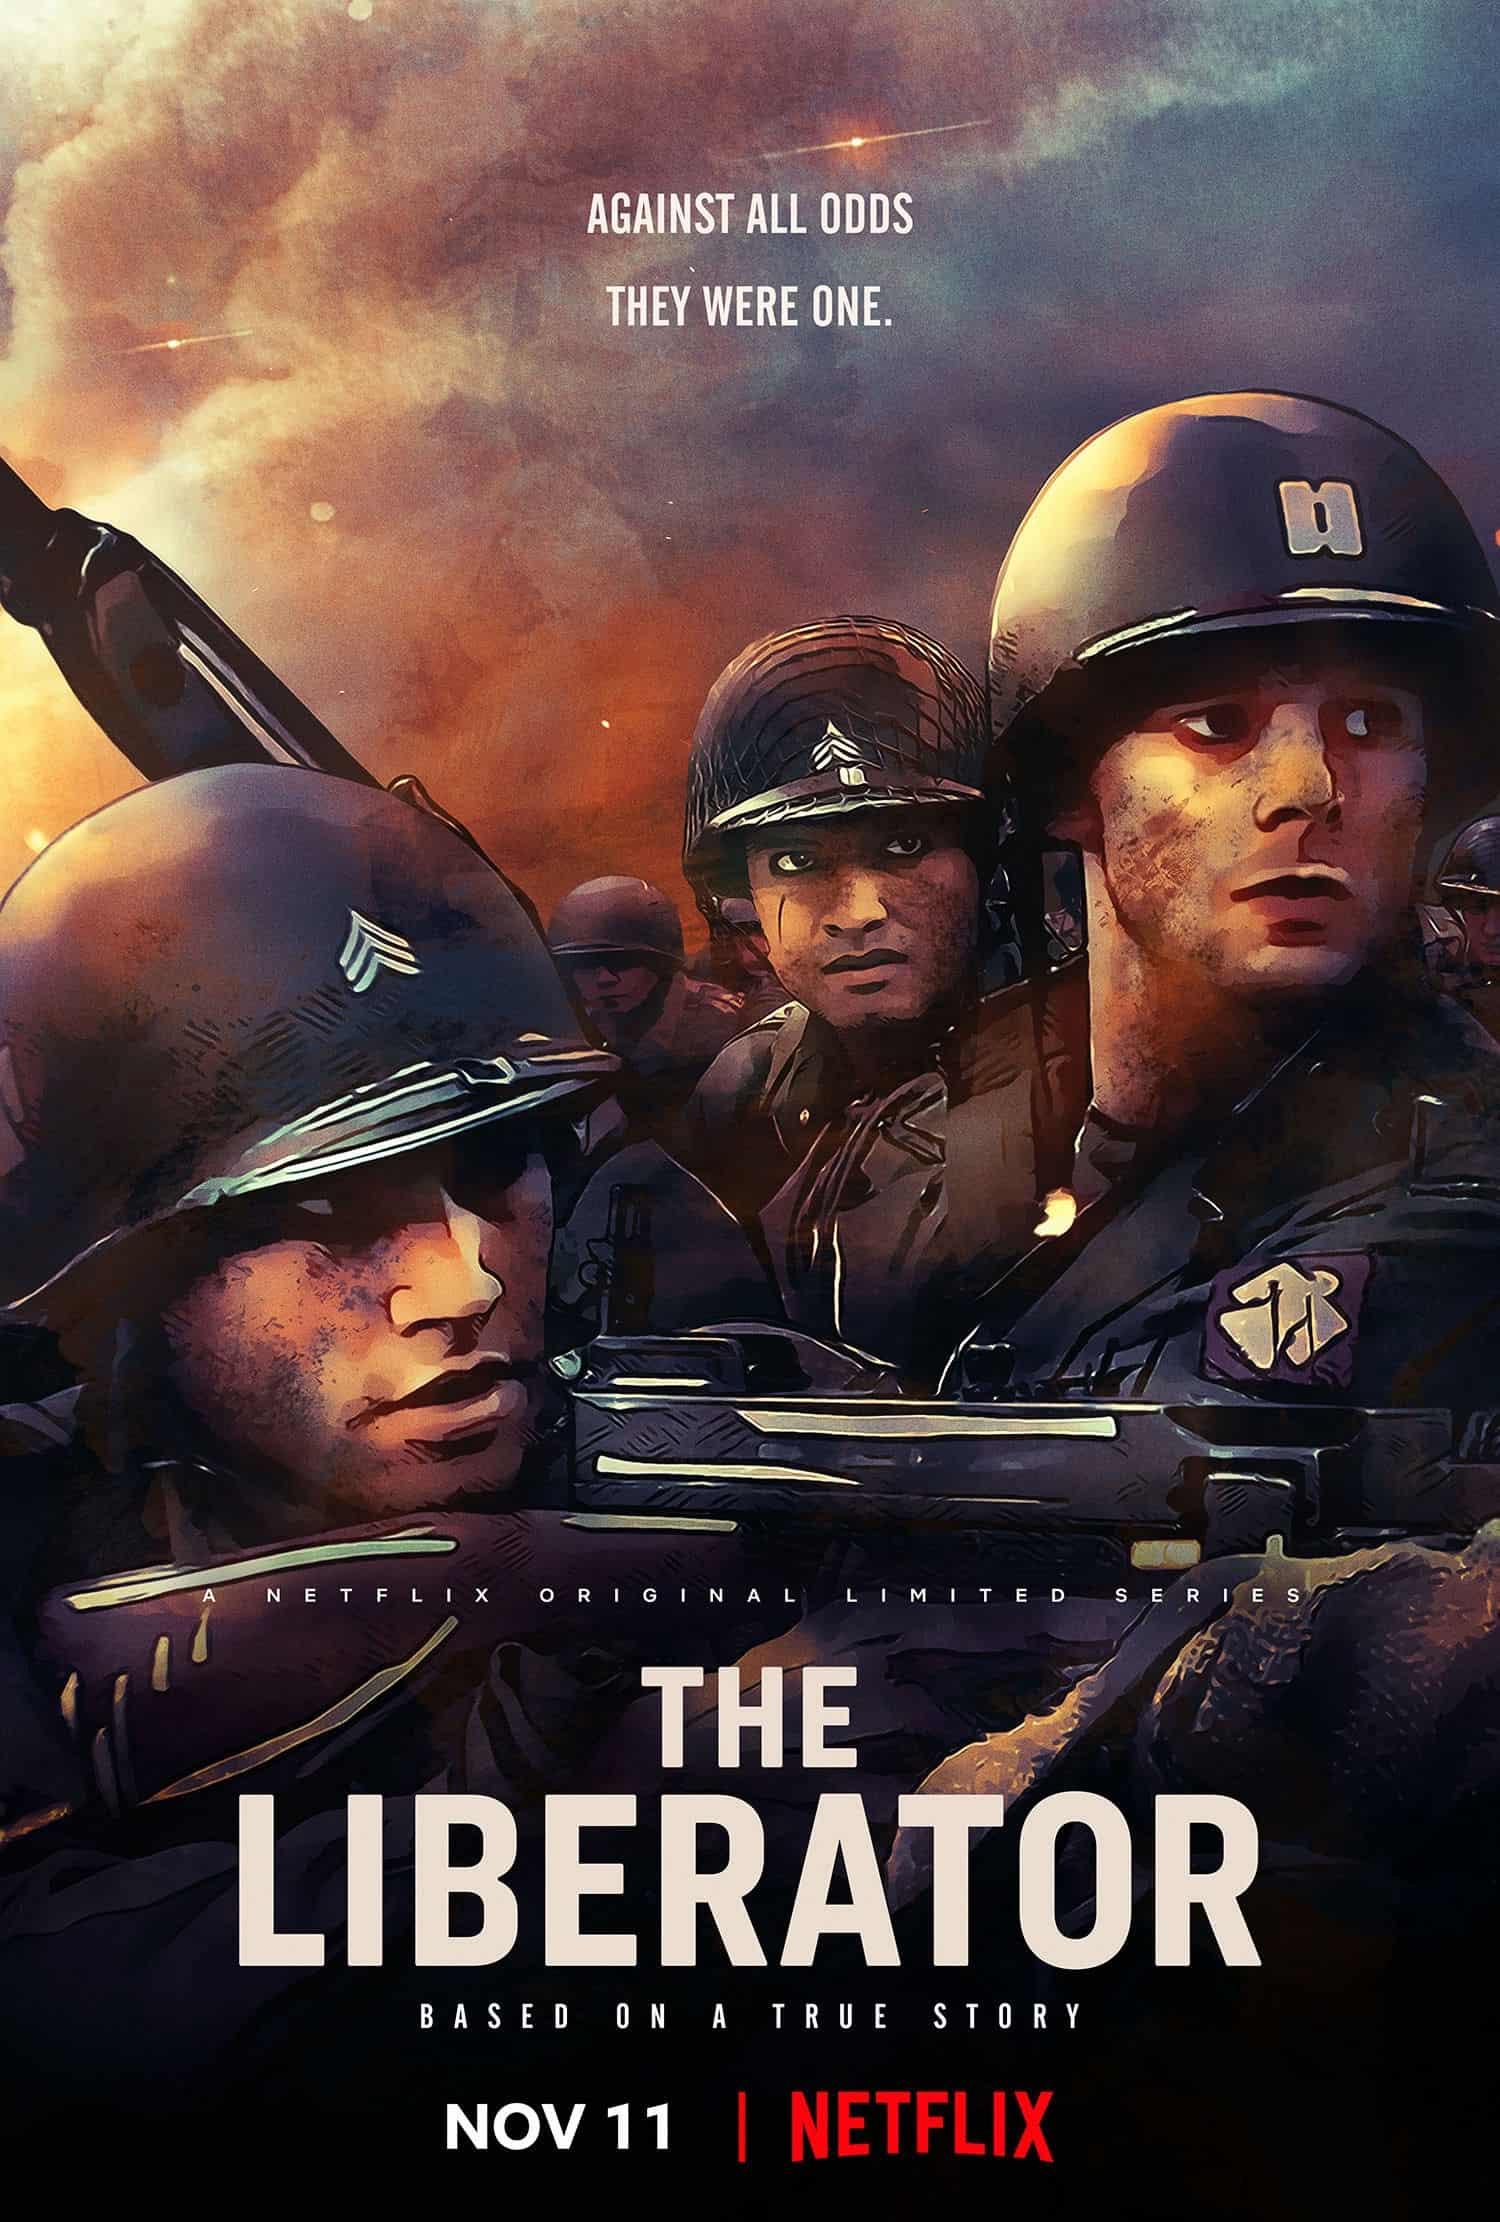 The Liberator Season 1 (2020) ผู้ปลดปล่อย ปี1 ซับไทย EP1 – EP4 [จบ]